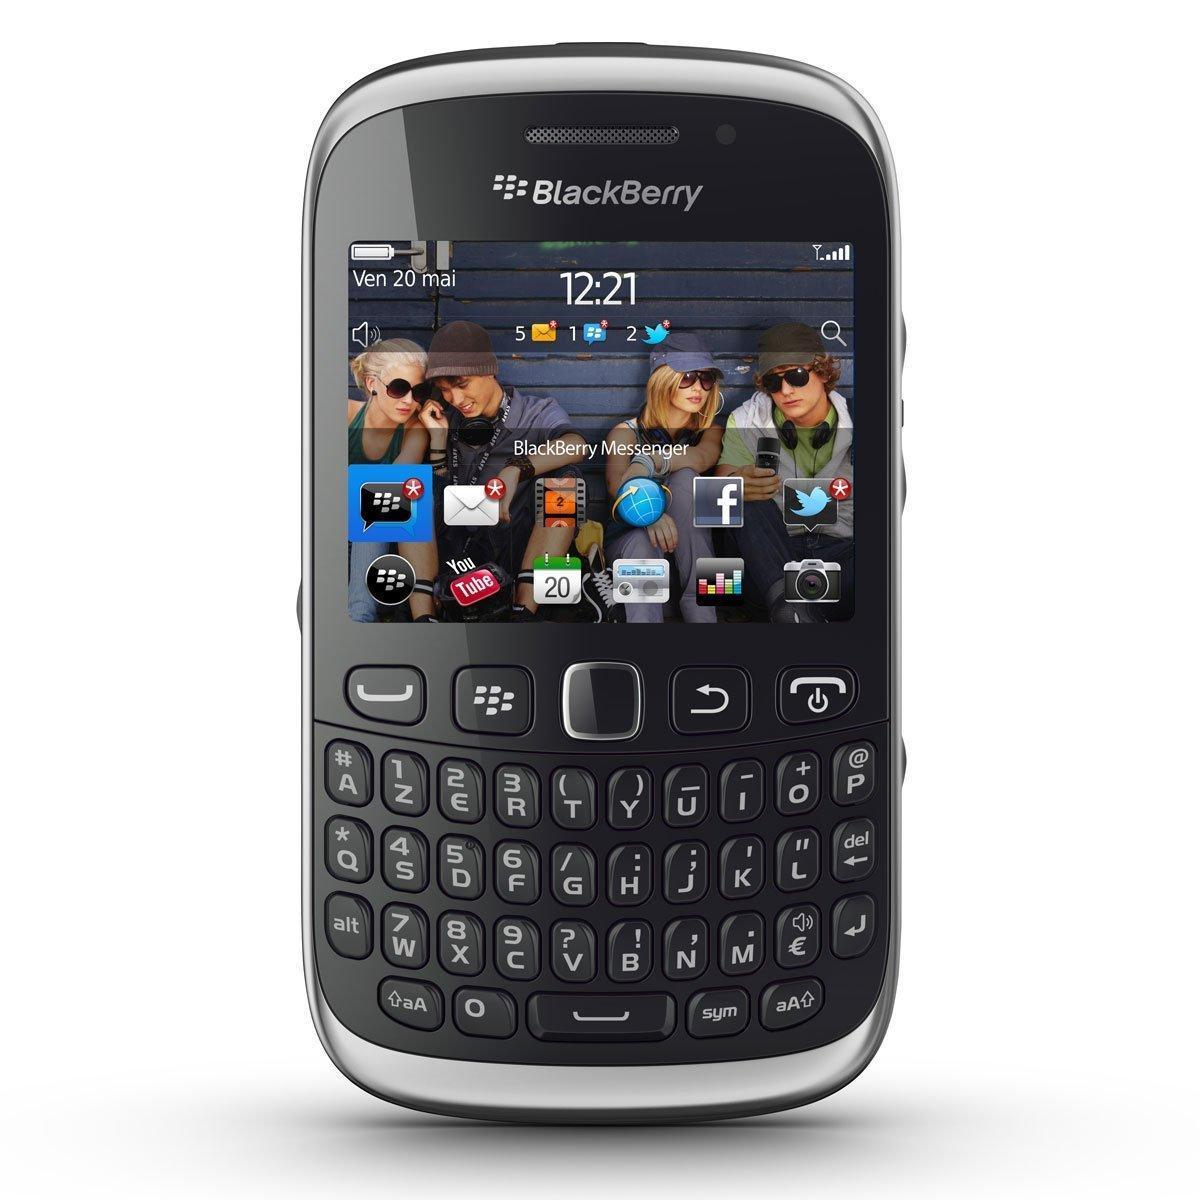 Blackberry Curve 9320 512 MB - Schwarz - Ohne Vertrag